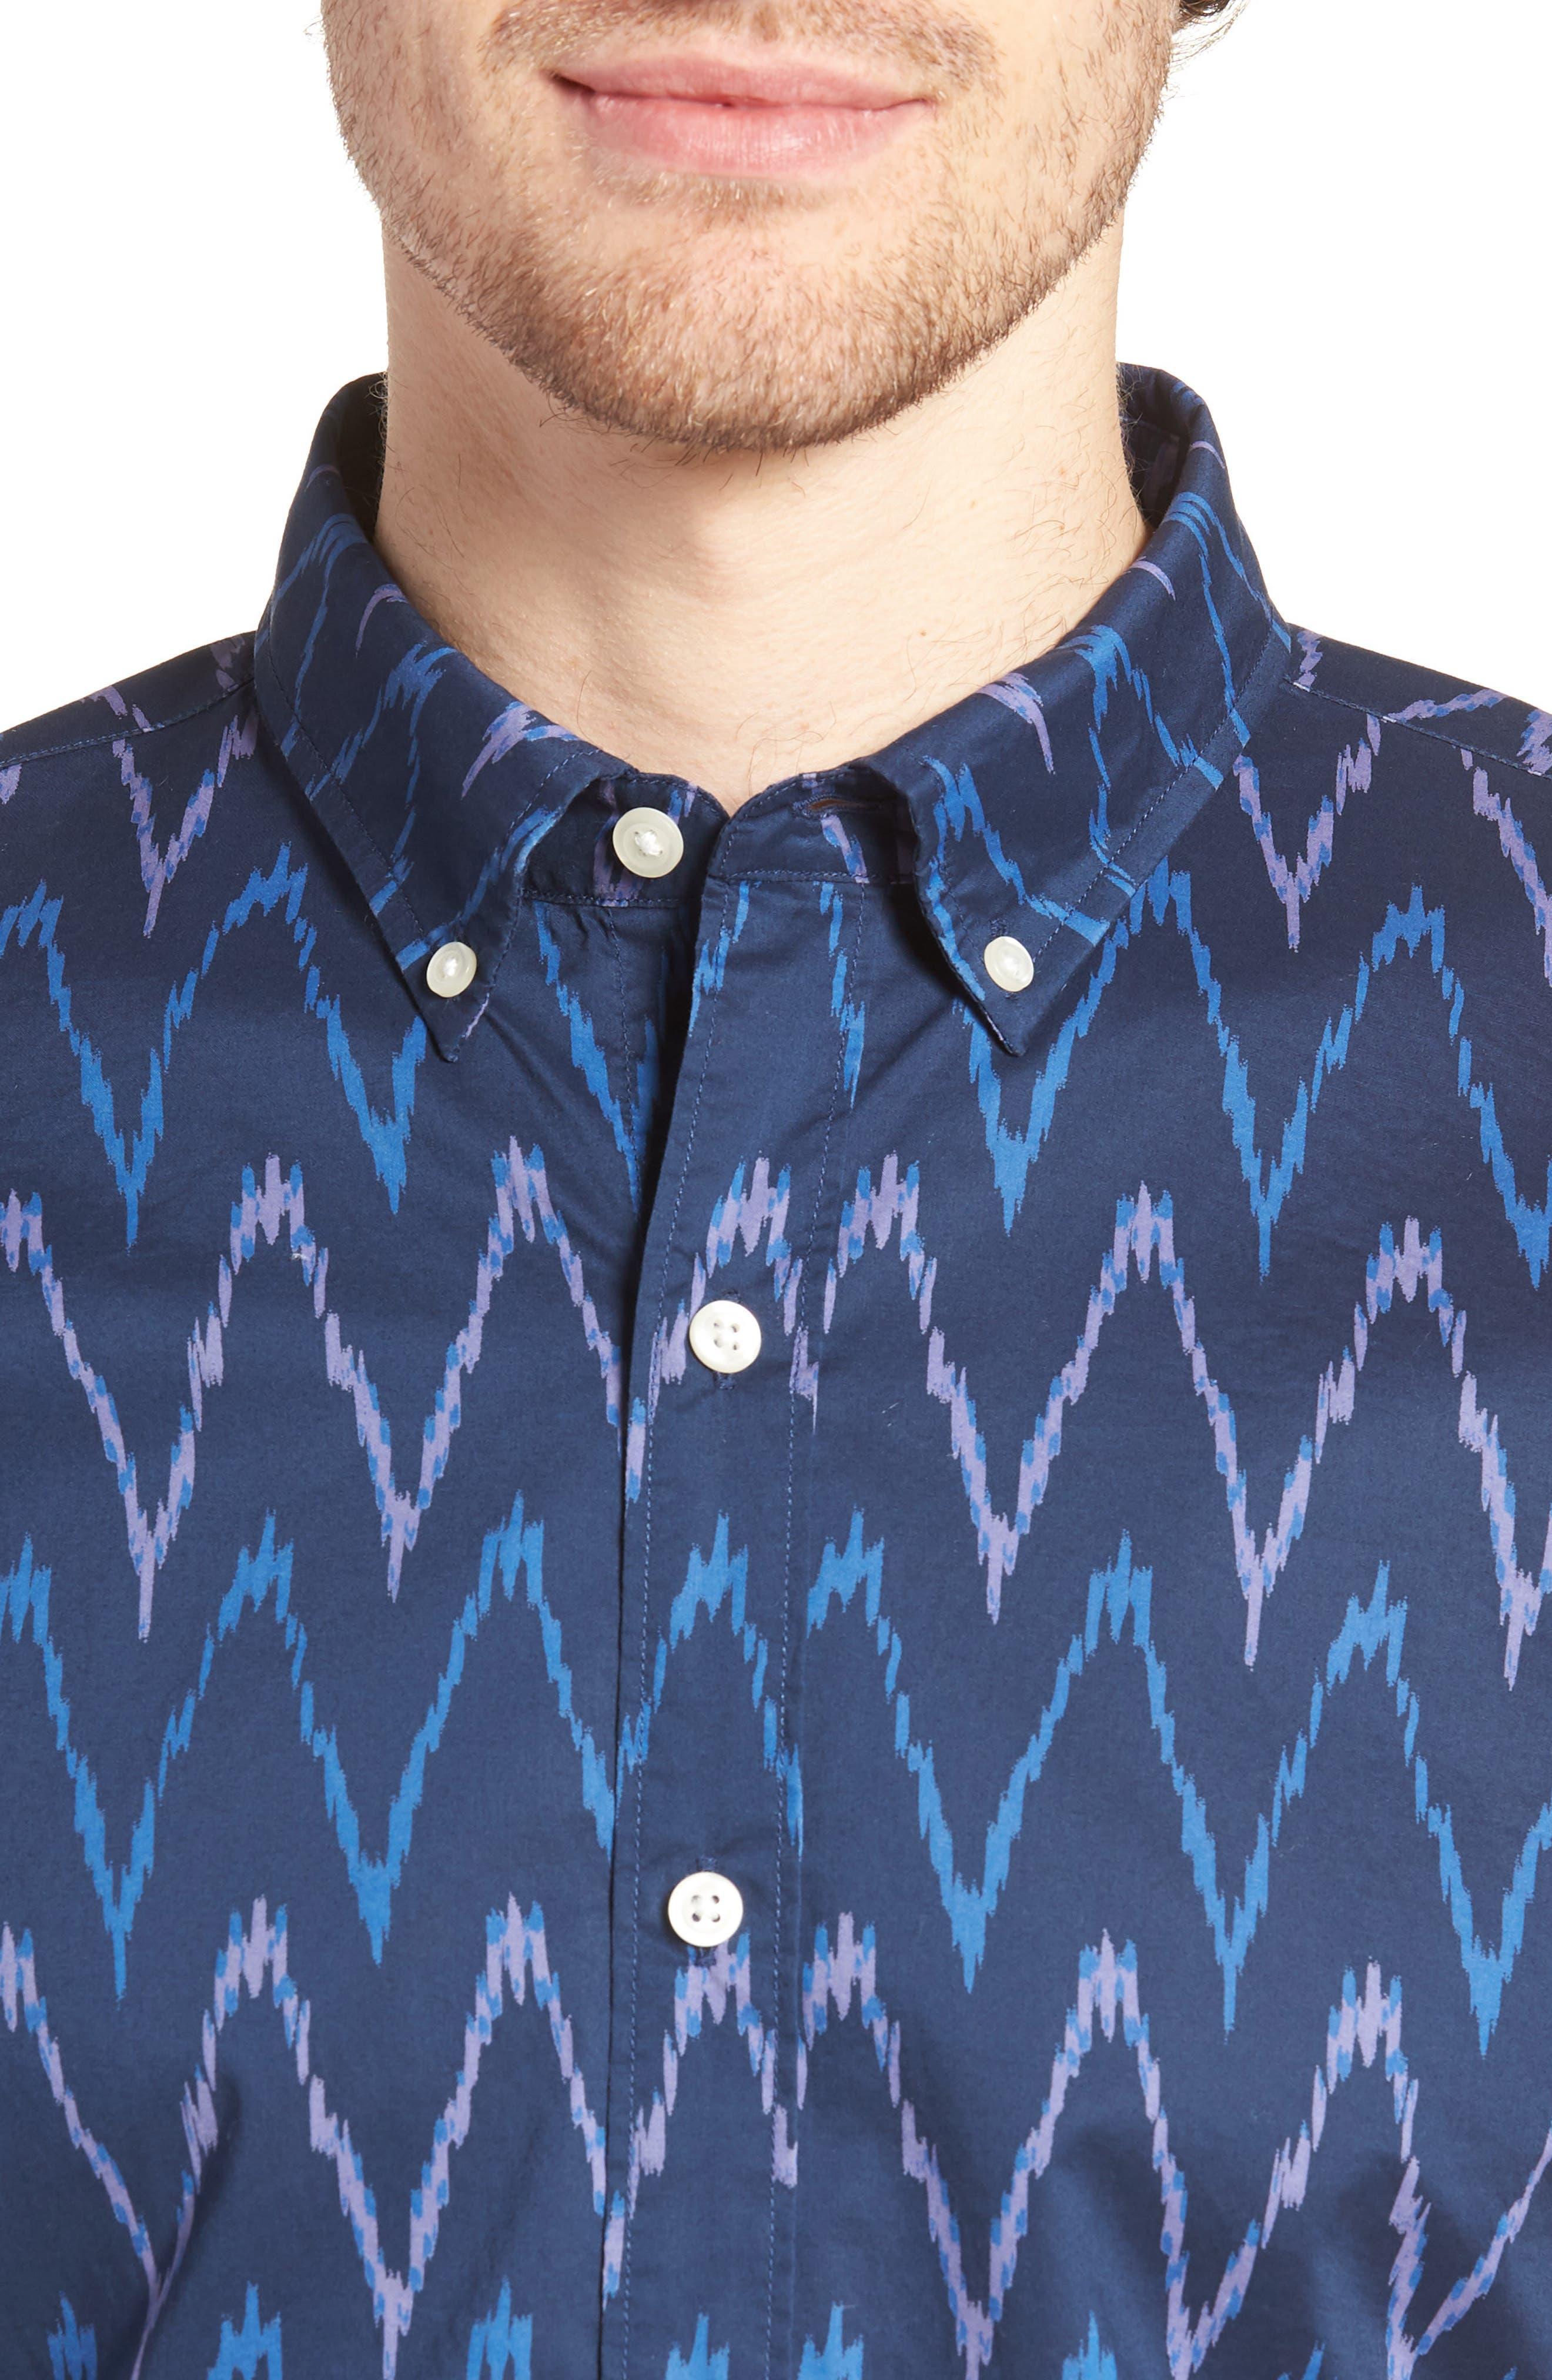 Riviera Slim Fit Ikat Print Sport Shirt,                             Alternate thumbnail 4, color,                             PRINTED IKAT - DEEP PACIFIC